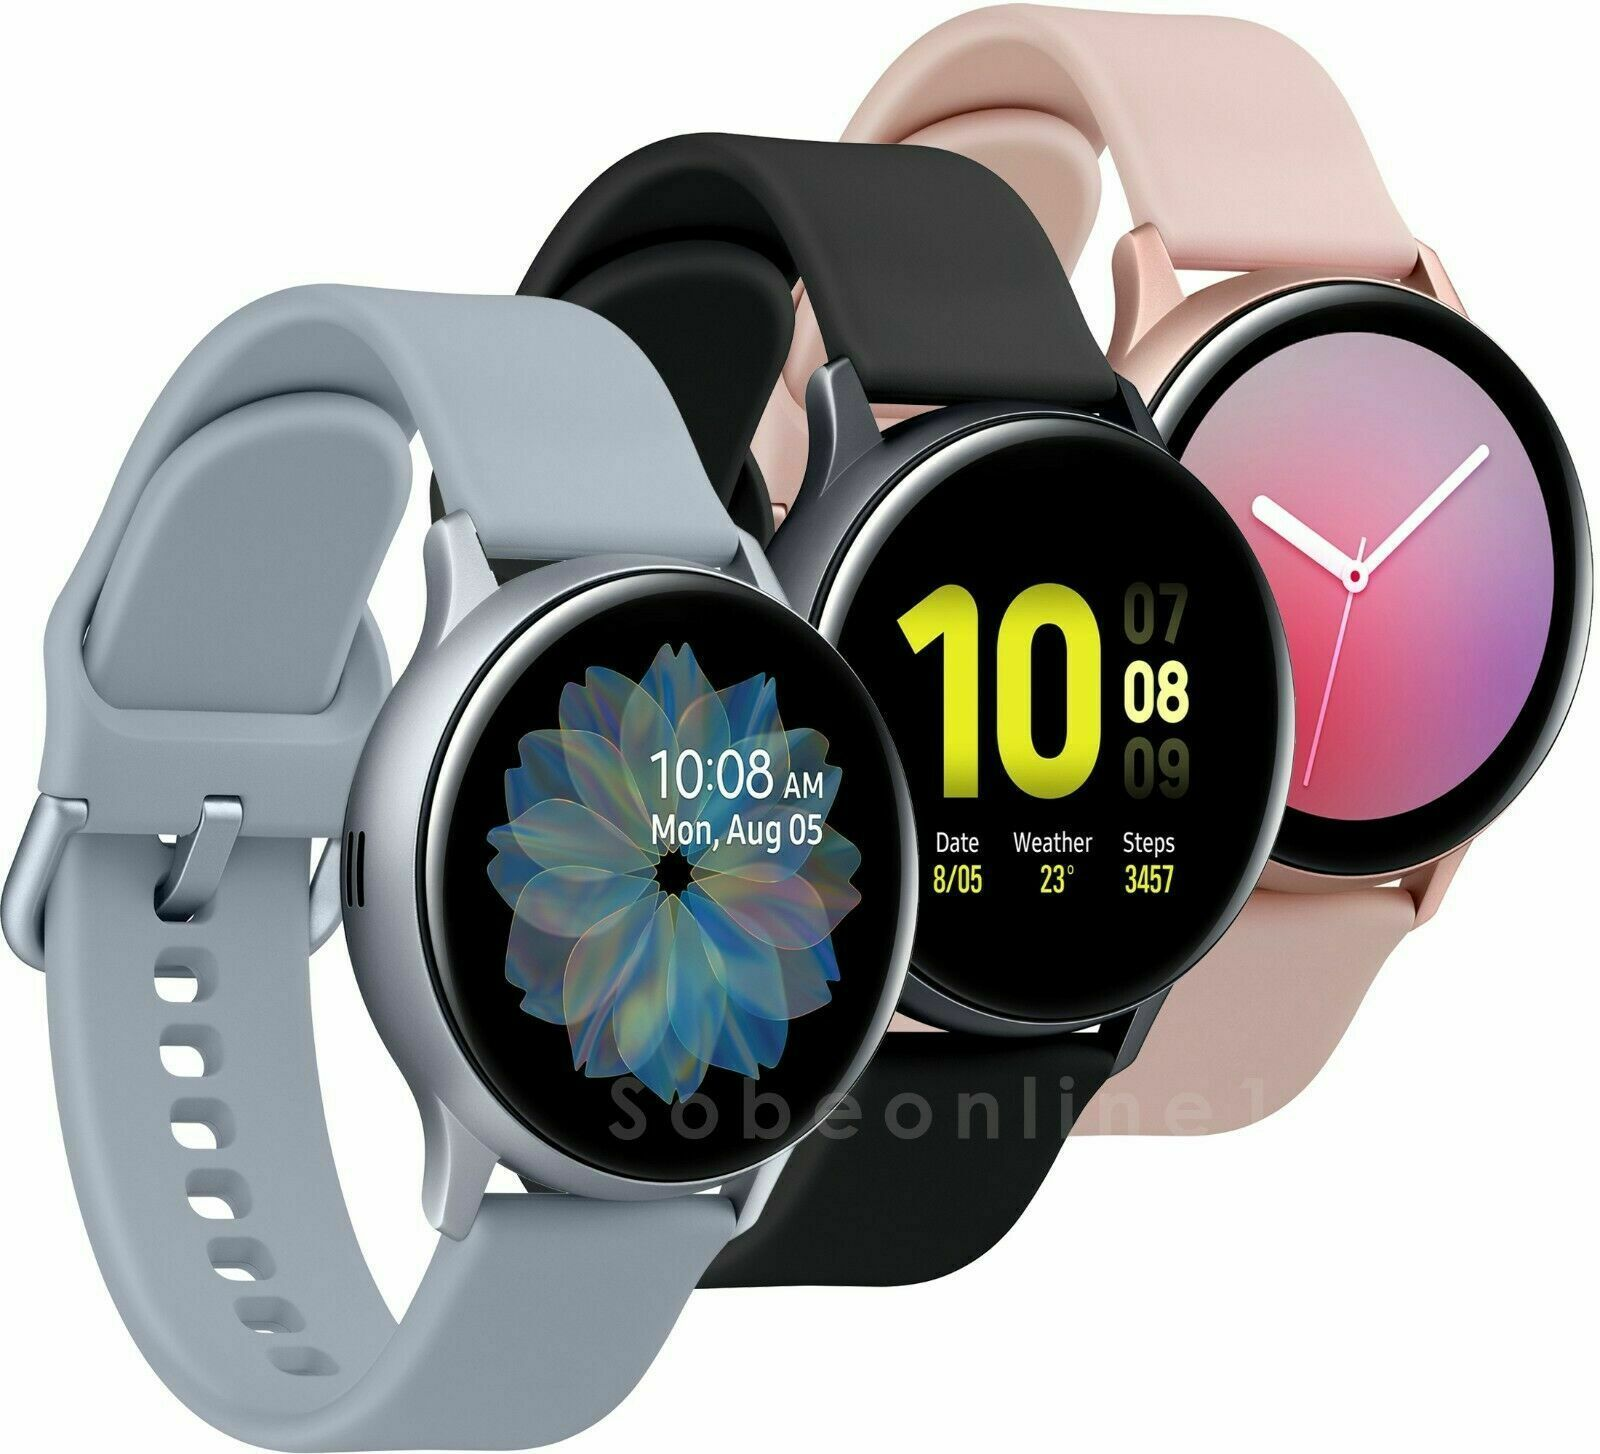 Samsung Galaxy Watch Active 2 SM-R830 40mm Bluetooth Water-Resistant Smart Watch